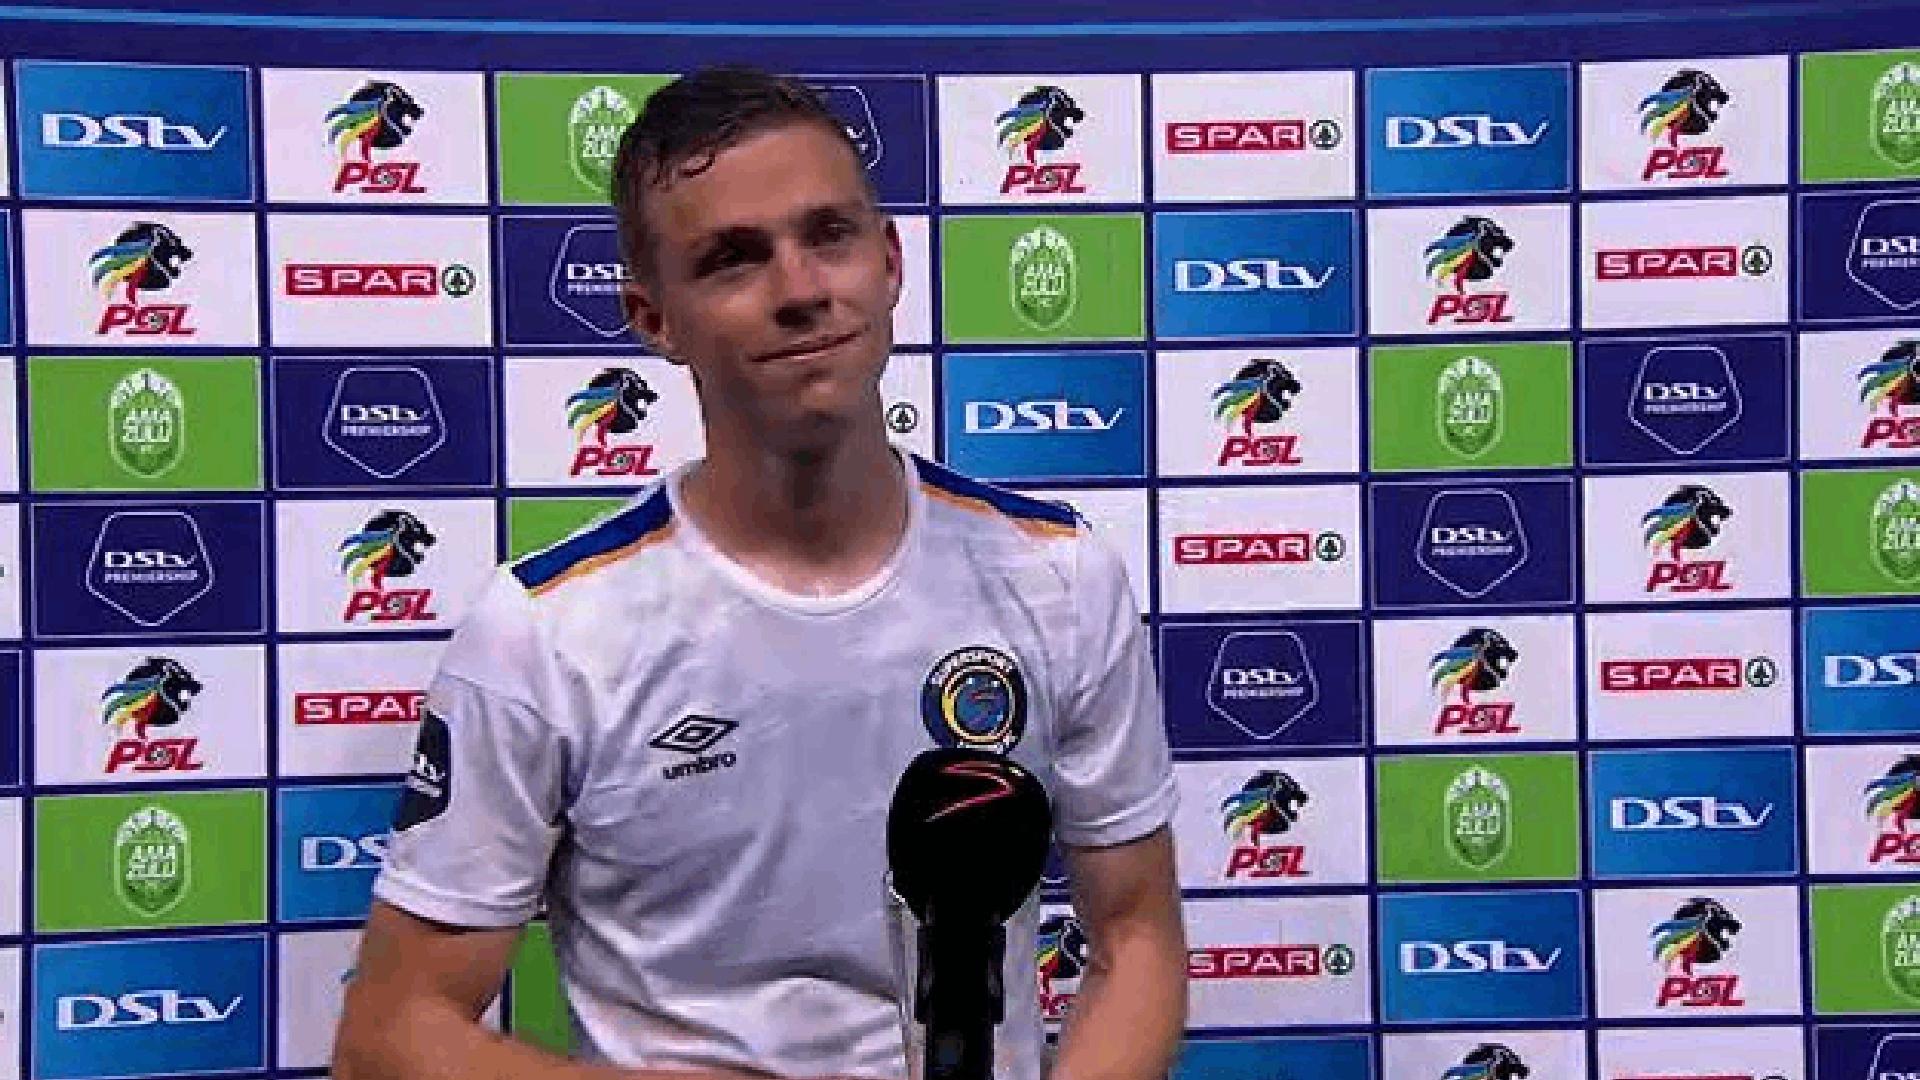 DStv Premiership | AmaZulu v SuperSport United | Post-match interview with Jesse Donn